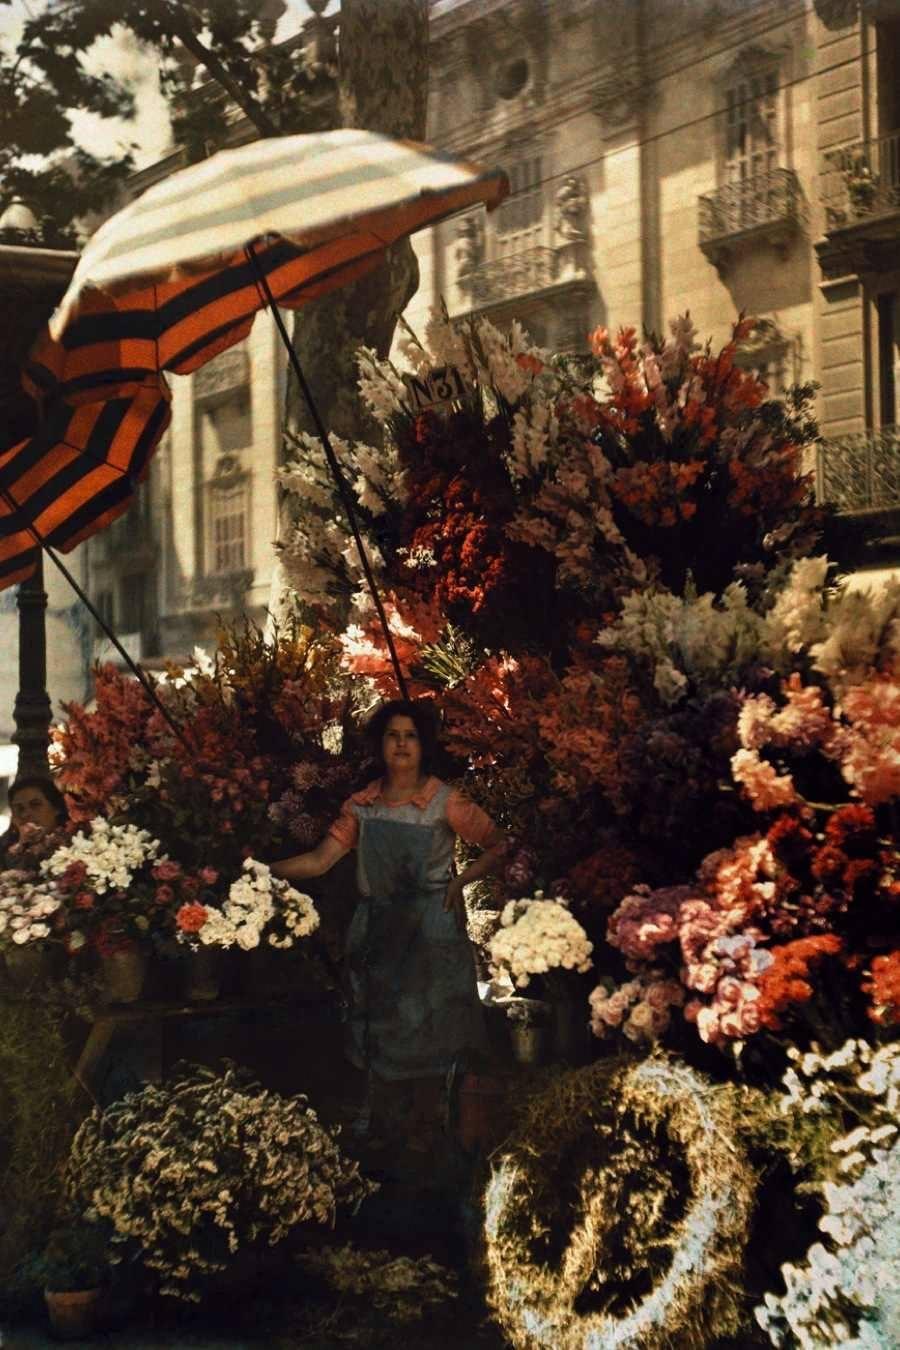 Barcelona Flowers